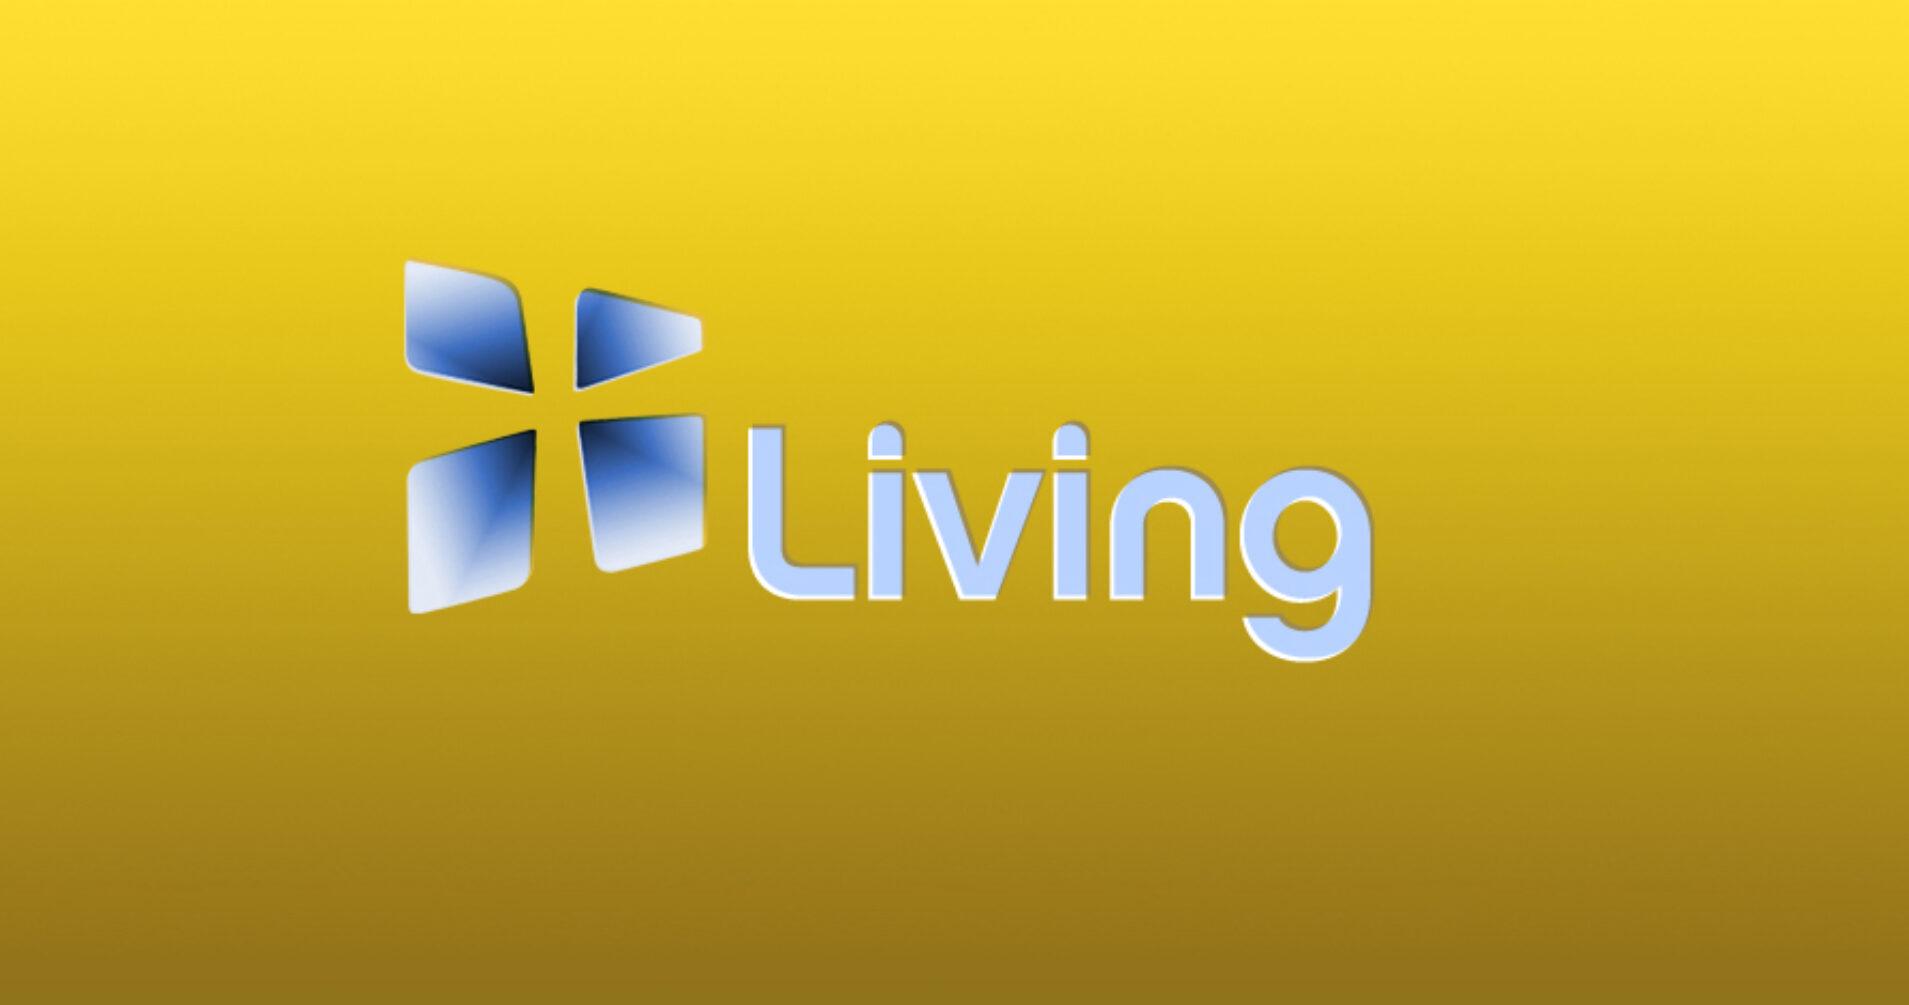 Living Faith Christian Church, Northridge CA - Logo and identity by Eric Scott/Day For Night